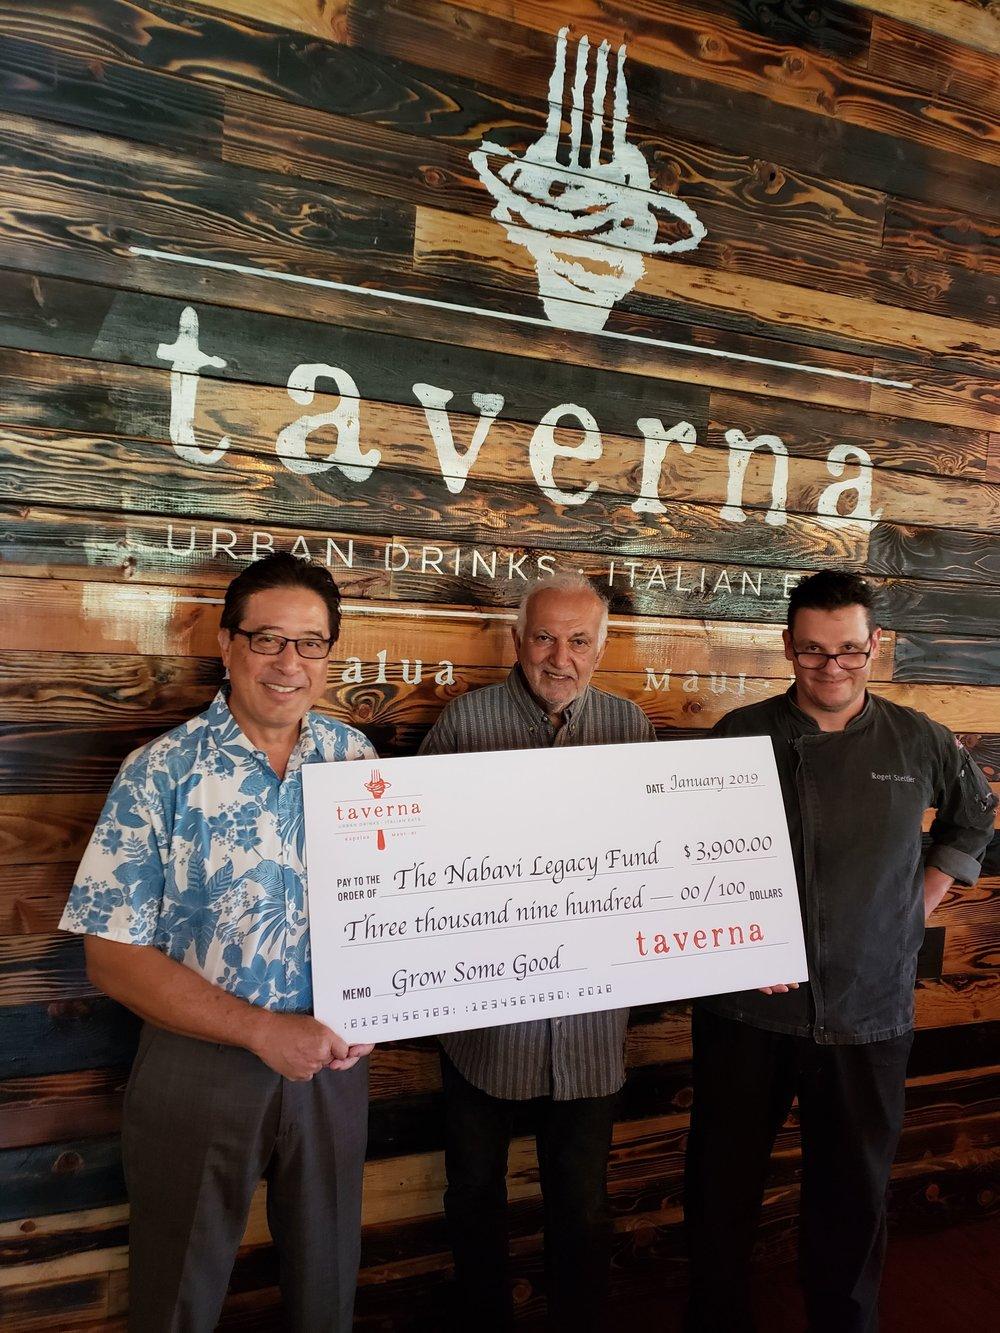 Taverna principal partner Chris Kaiwi, Nabavi Legacy Fund founder Paris Nabavi and Taverna executive chef Roger Stettler with the donation check.